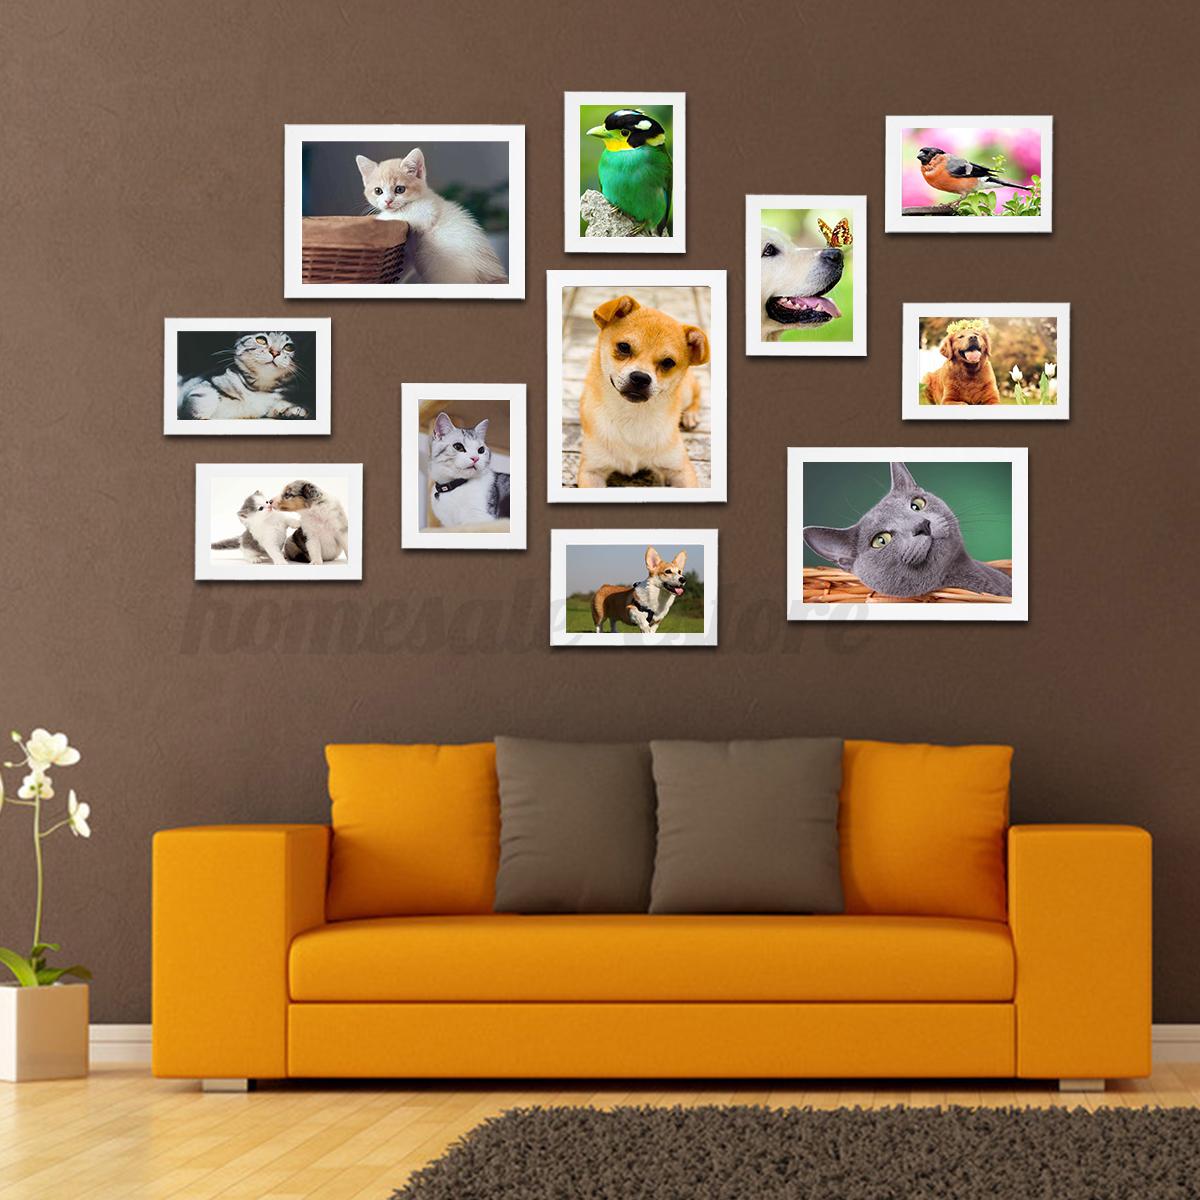 Enjoyable Details About 11Pcs Photo Frame Set Hanging Picture Modern Display Wall Art Home Decor Download Free Architecture Designs Scobabritishbridgeorg